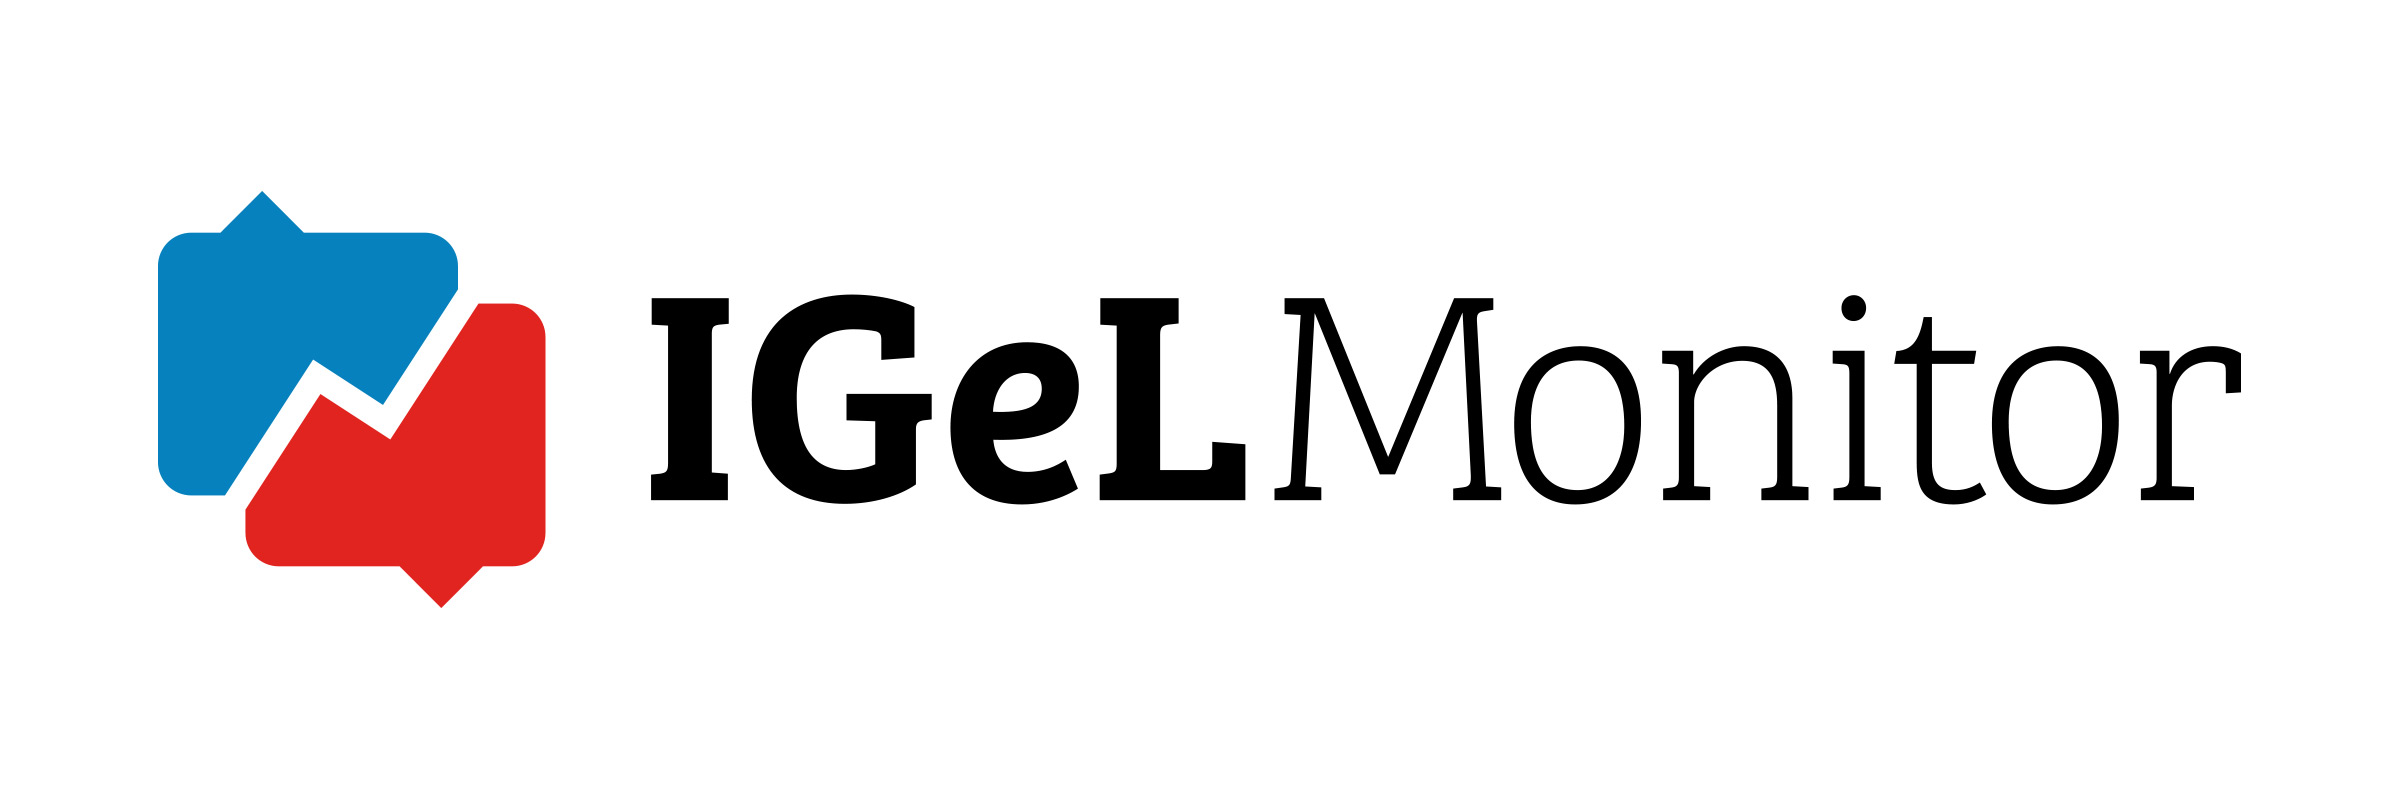 File:IGeL-Monitor-Logo.jpg - Wikimedia Commons